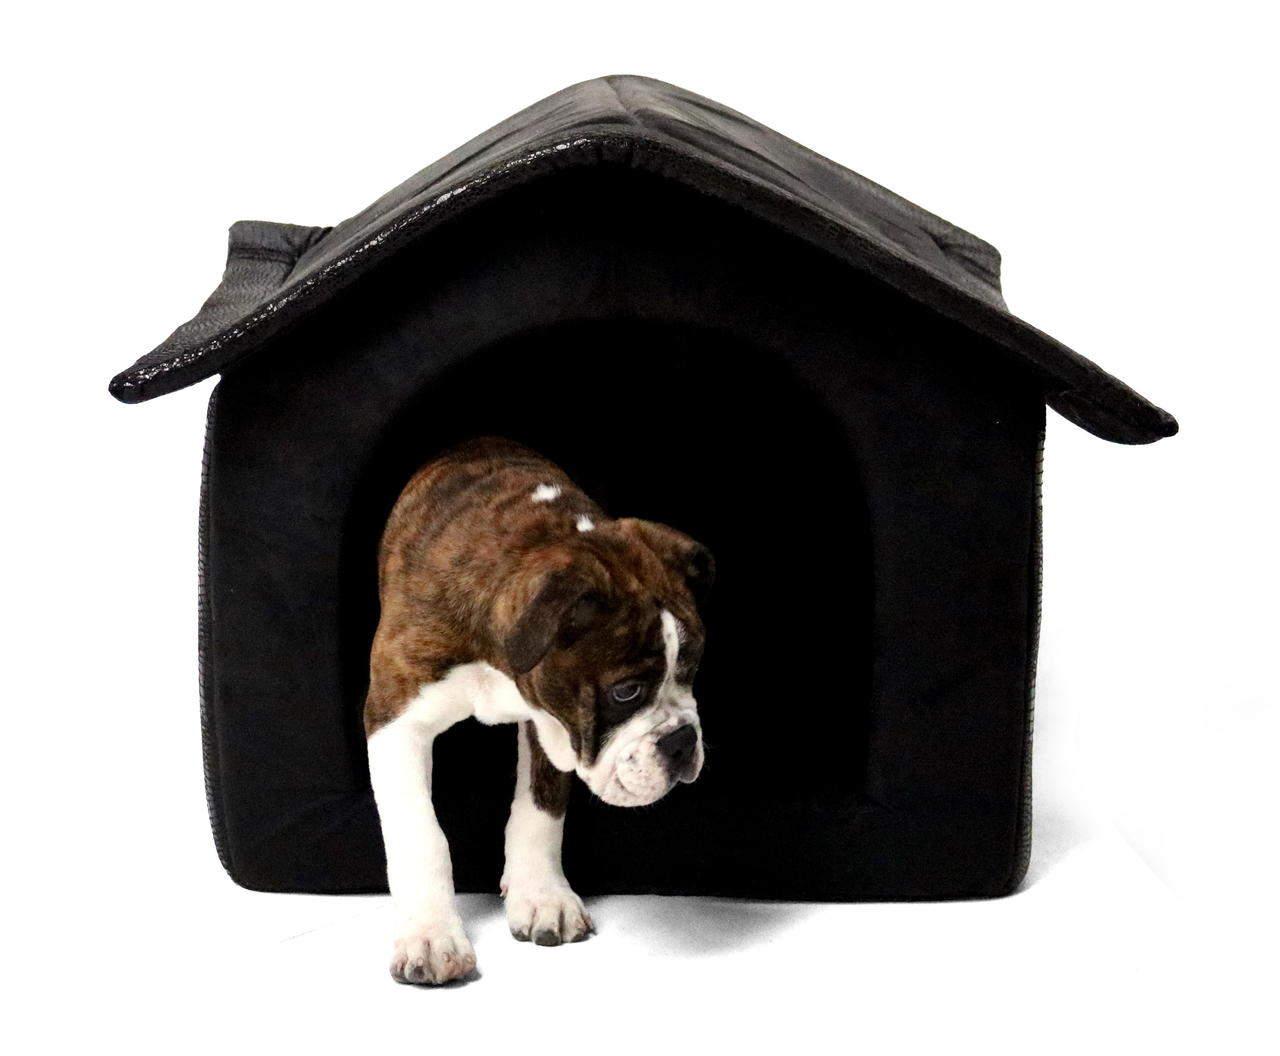 Stoff-Hundehütte / Hundehöhle, schwarz - 64 x 57 x 60 cm